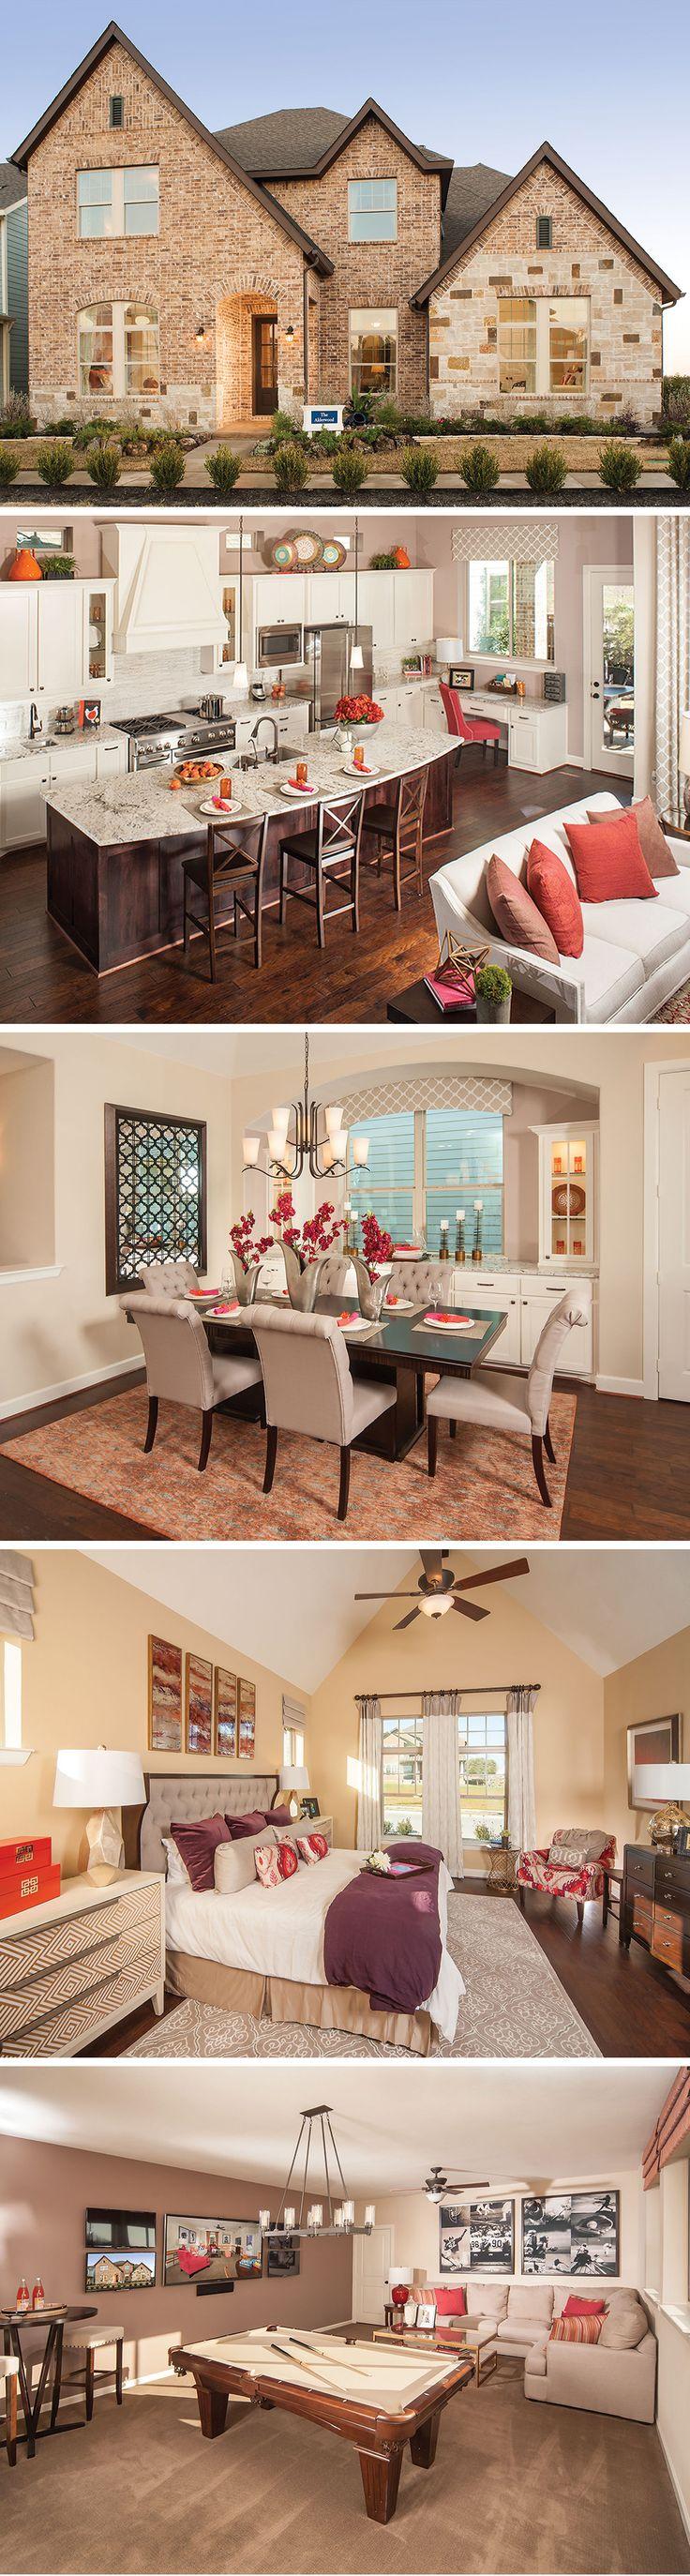 Best Ideas About Model Home Decorating On Pinterest Living - Model homes interior design